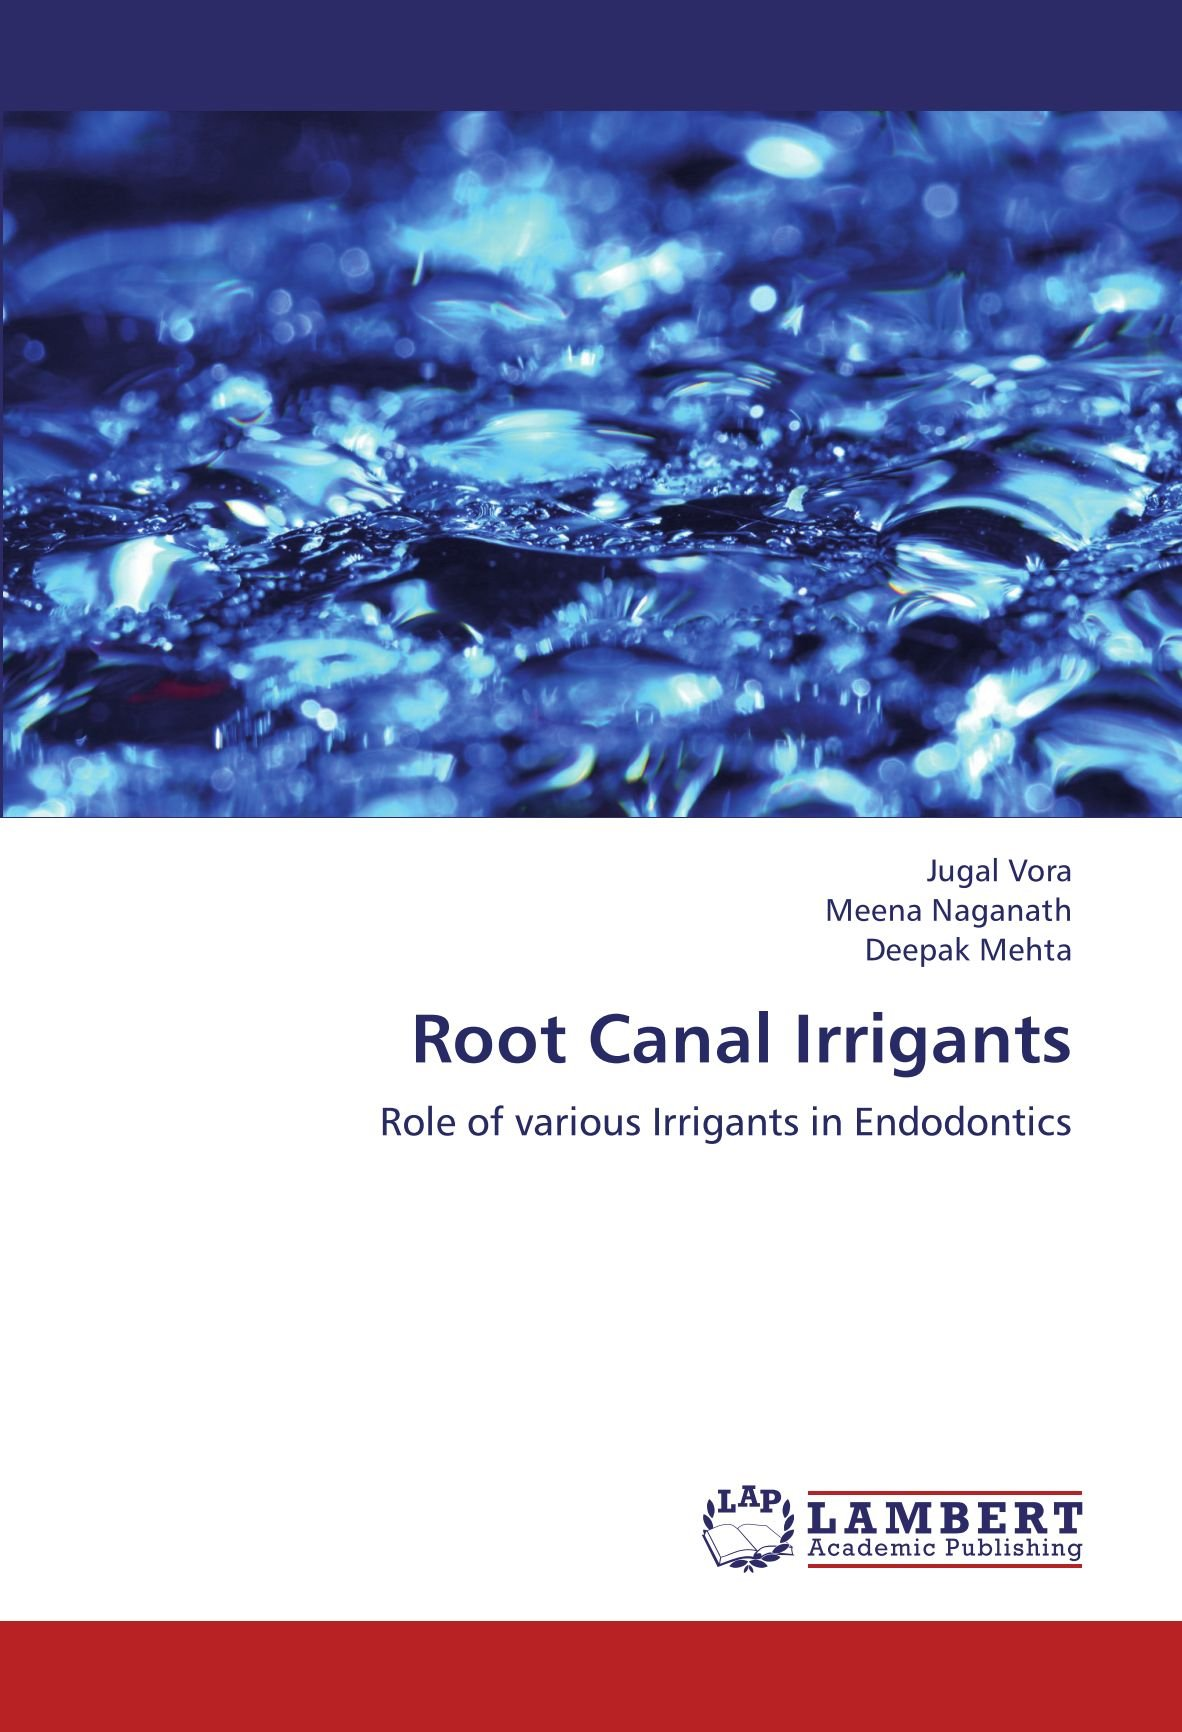 Root Canal Irrigants: Role of various Irrigants in Endodontics